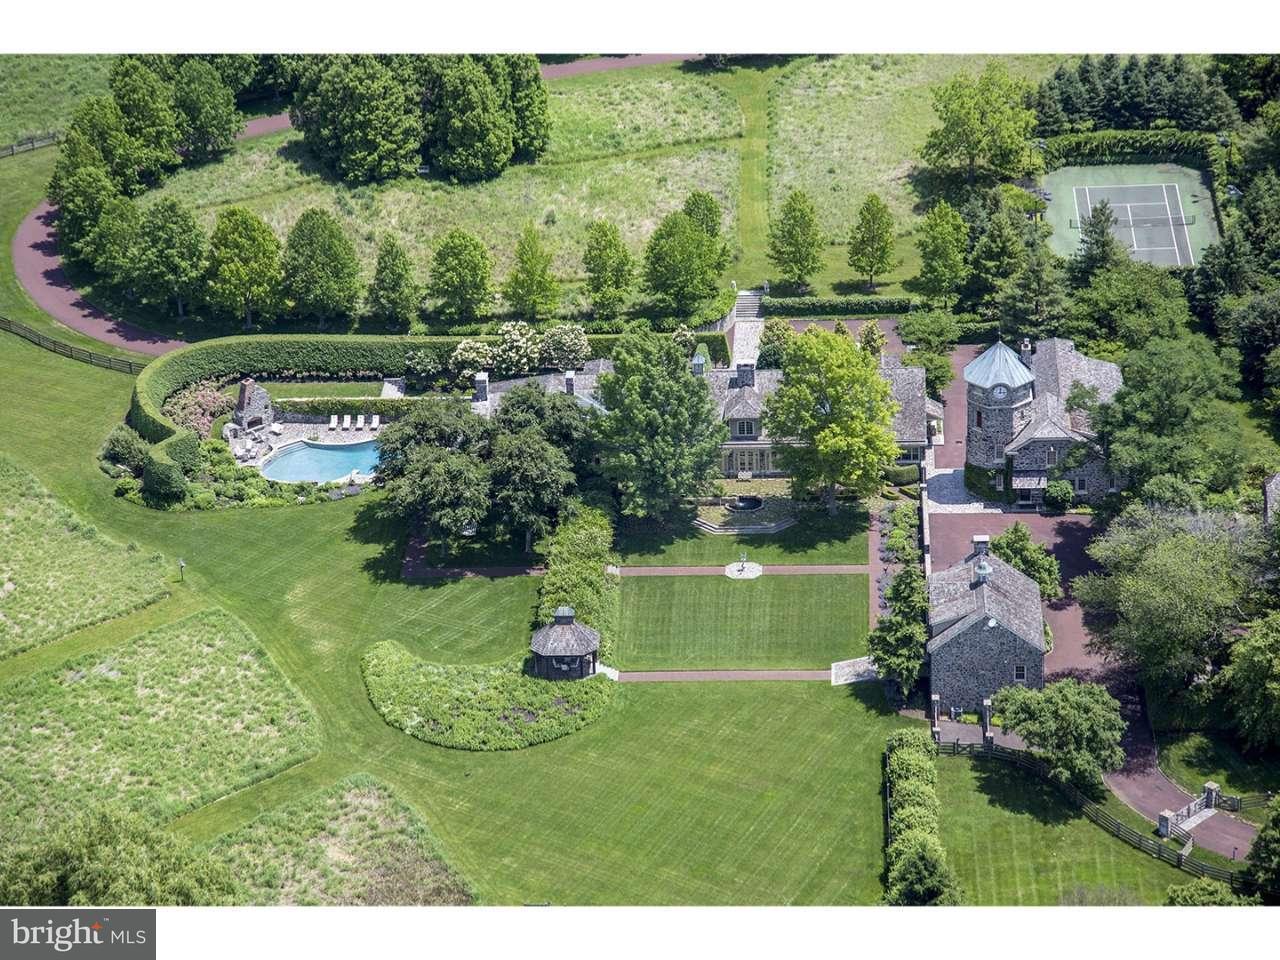 Single Family Home for Sale at 770 GODFREY Road Villanova, Pennsylvania 19085 United States